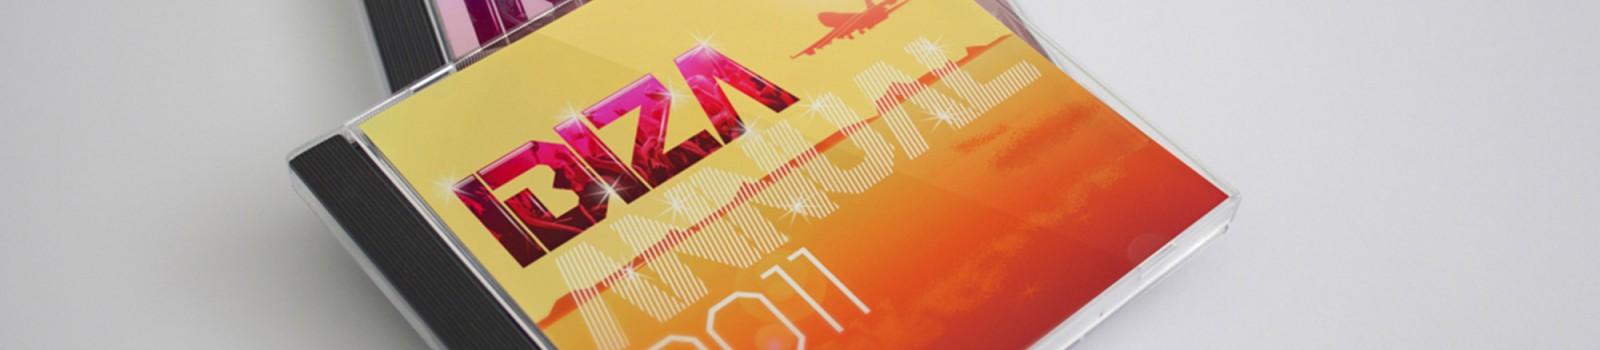 Ministry Of Sound Ibiza Annual 2011 Case